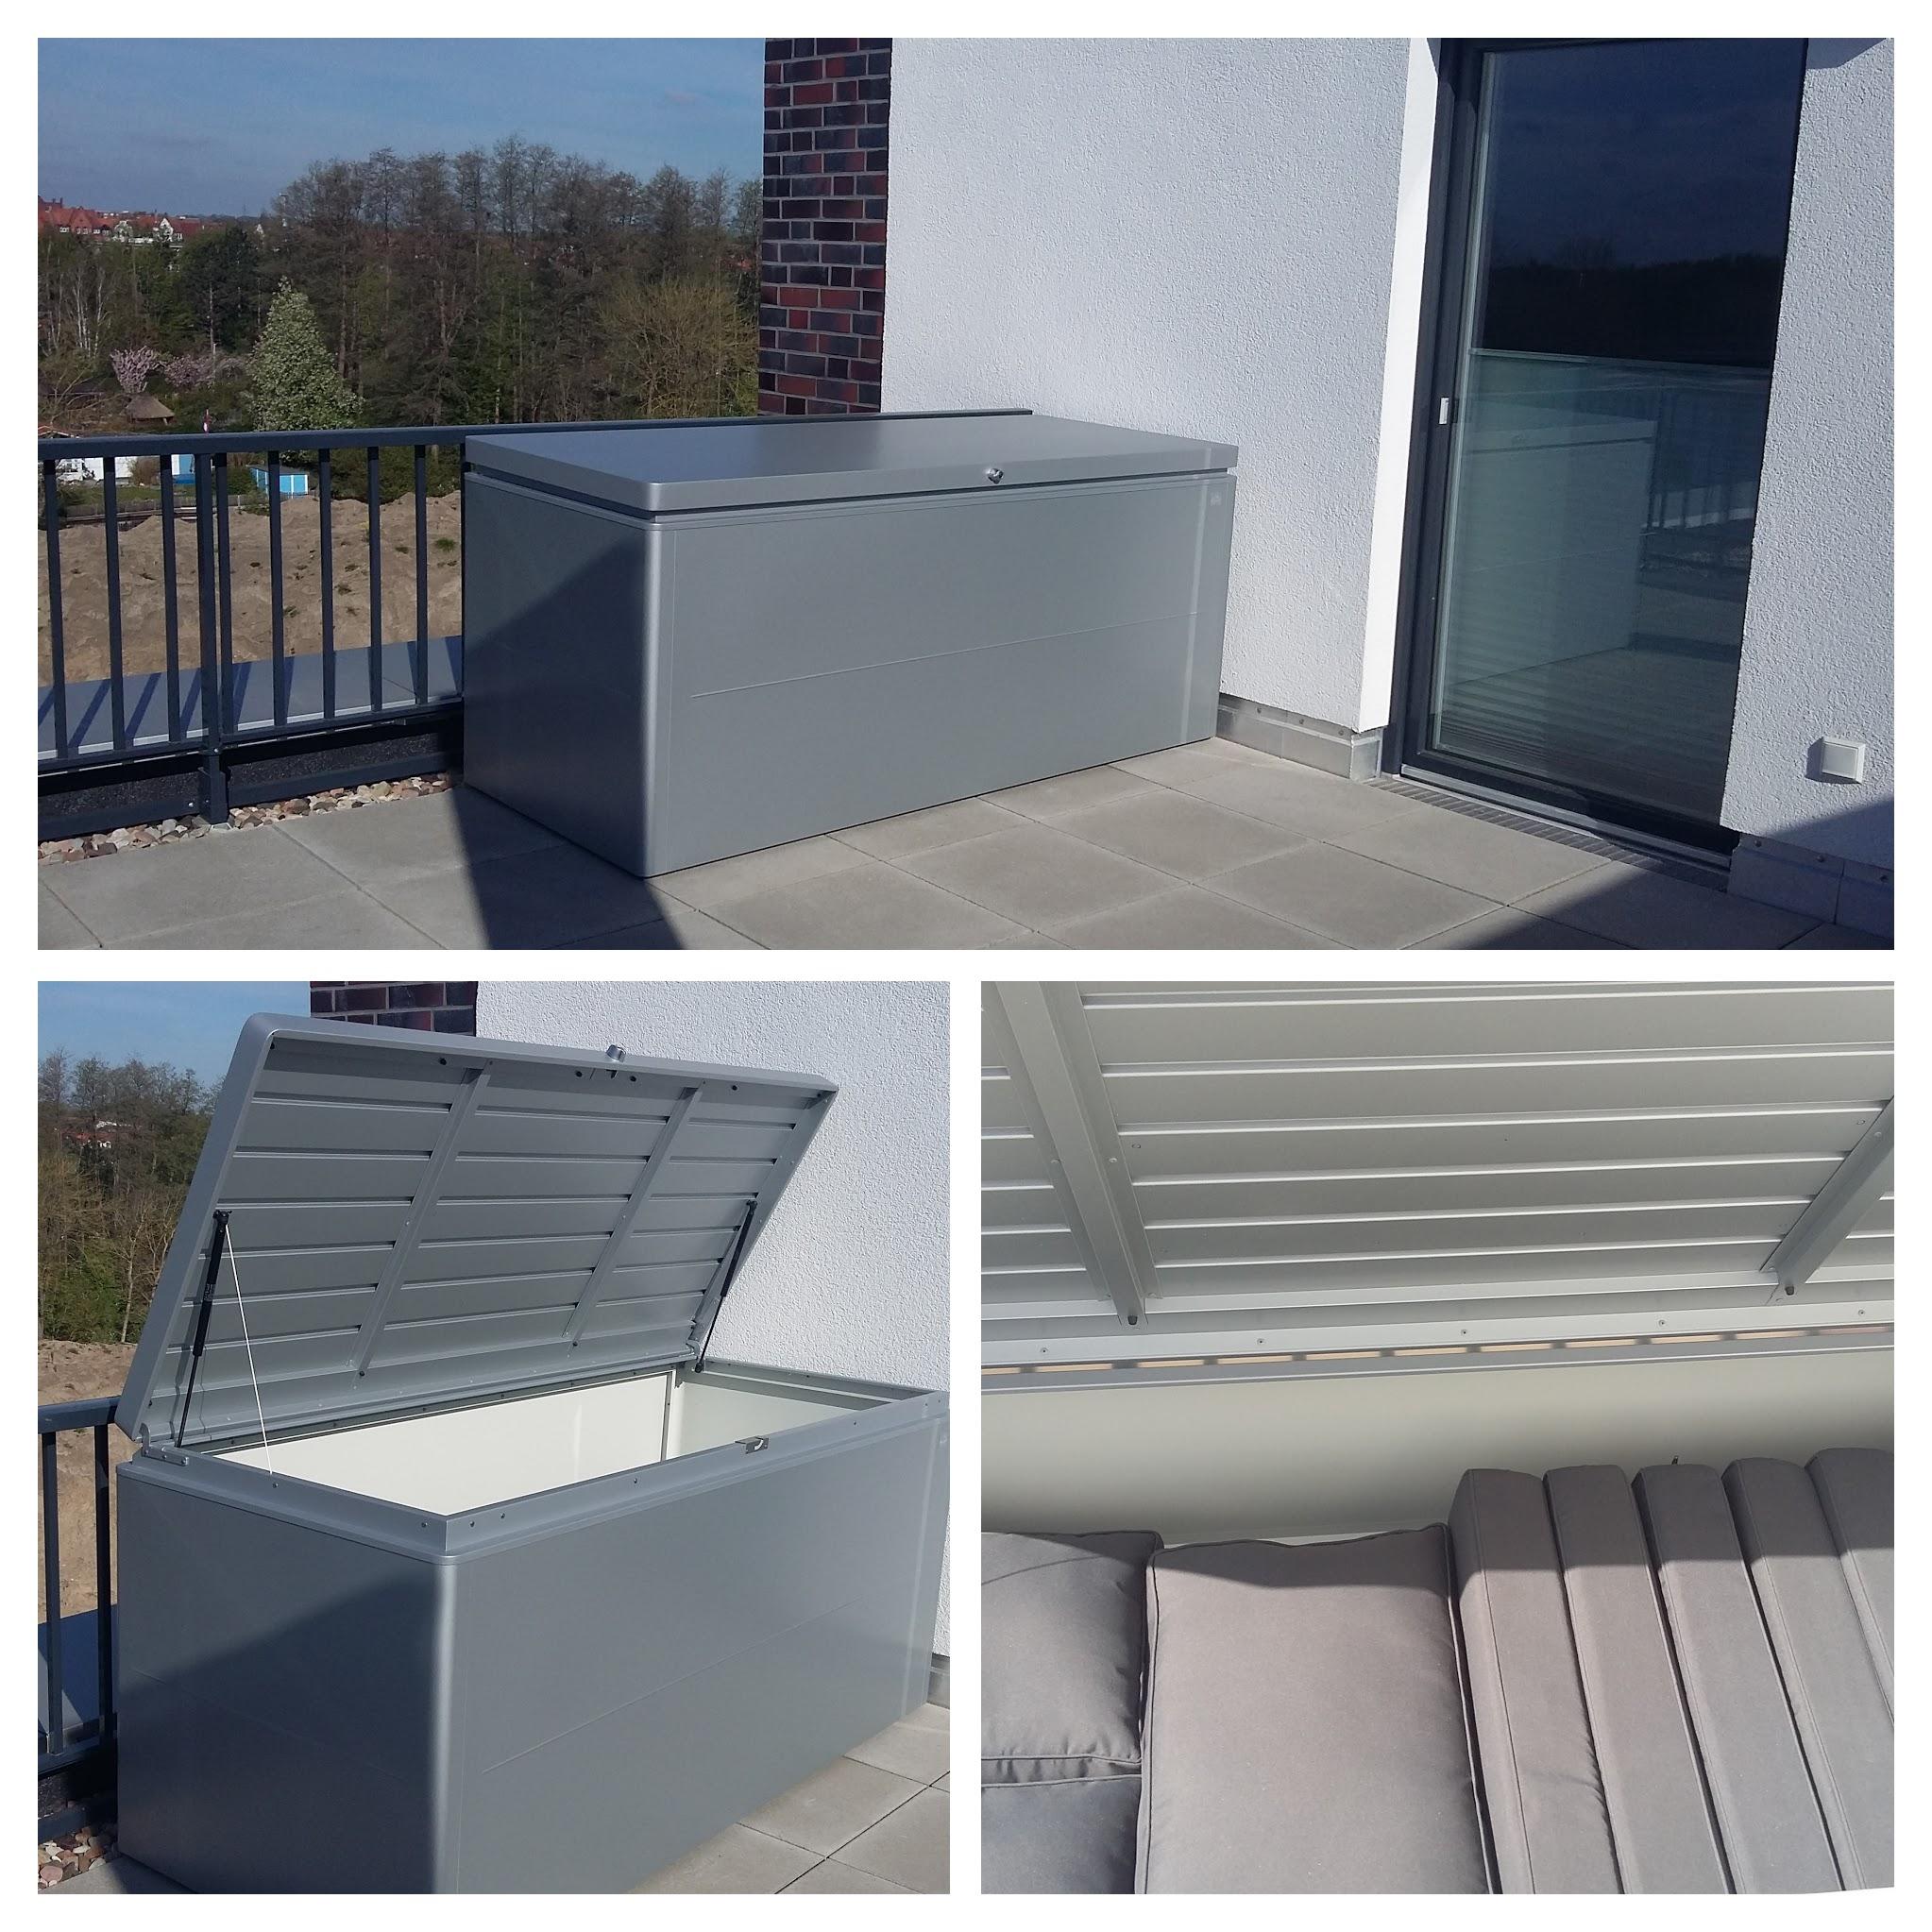 Sunfun Garten Aufbewahrungsbox 160 X 72 X 80 Cm Anthrazit In 2021 Aufbewahrungsbox Aufbewahrung Garten Aufbewahrung